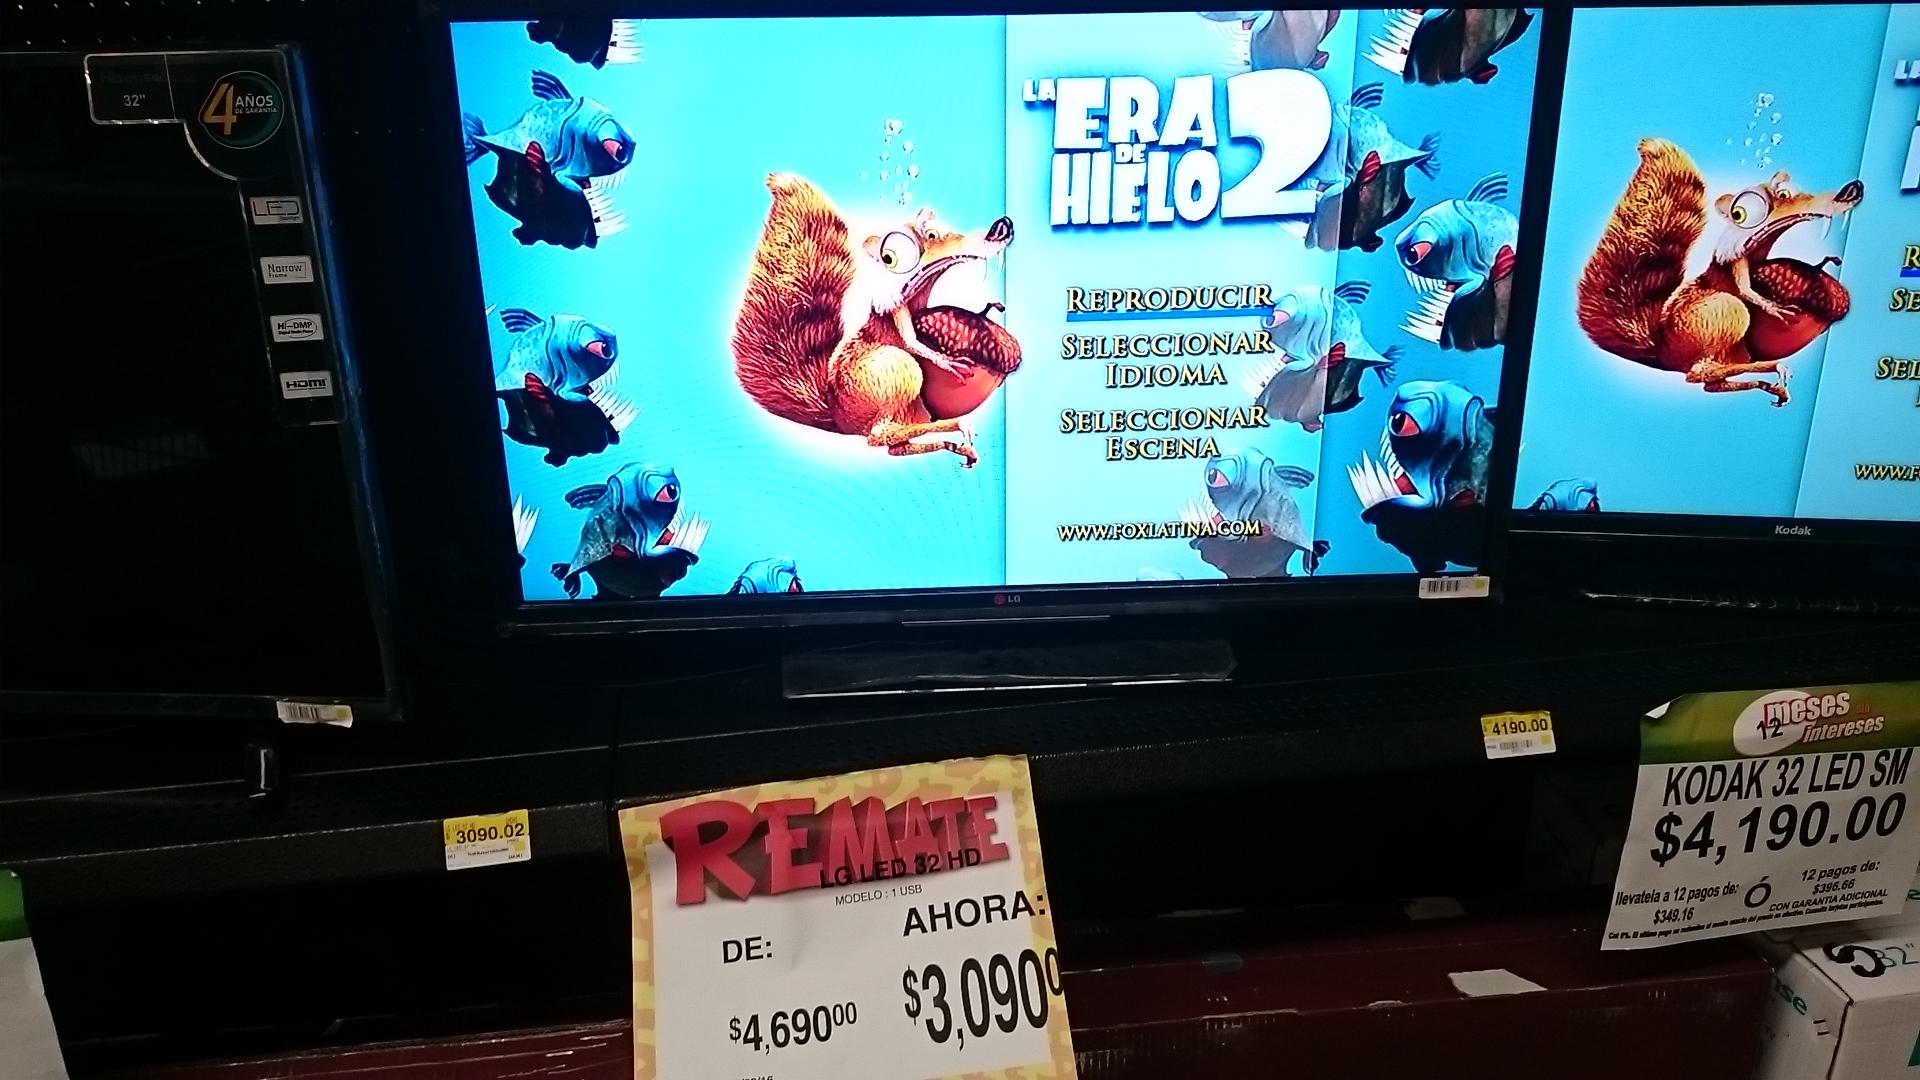 "Bodega Aurrerá: pantalla LG 32"" a $3,090.02"